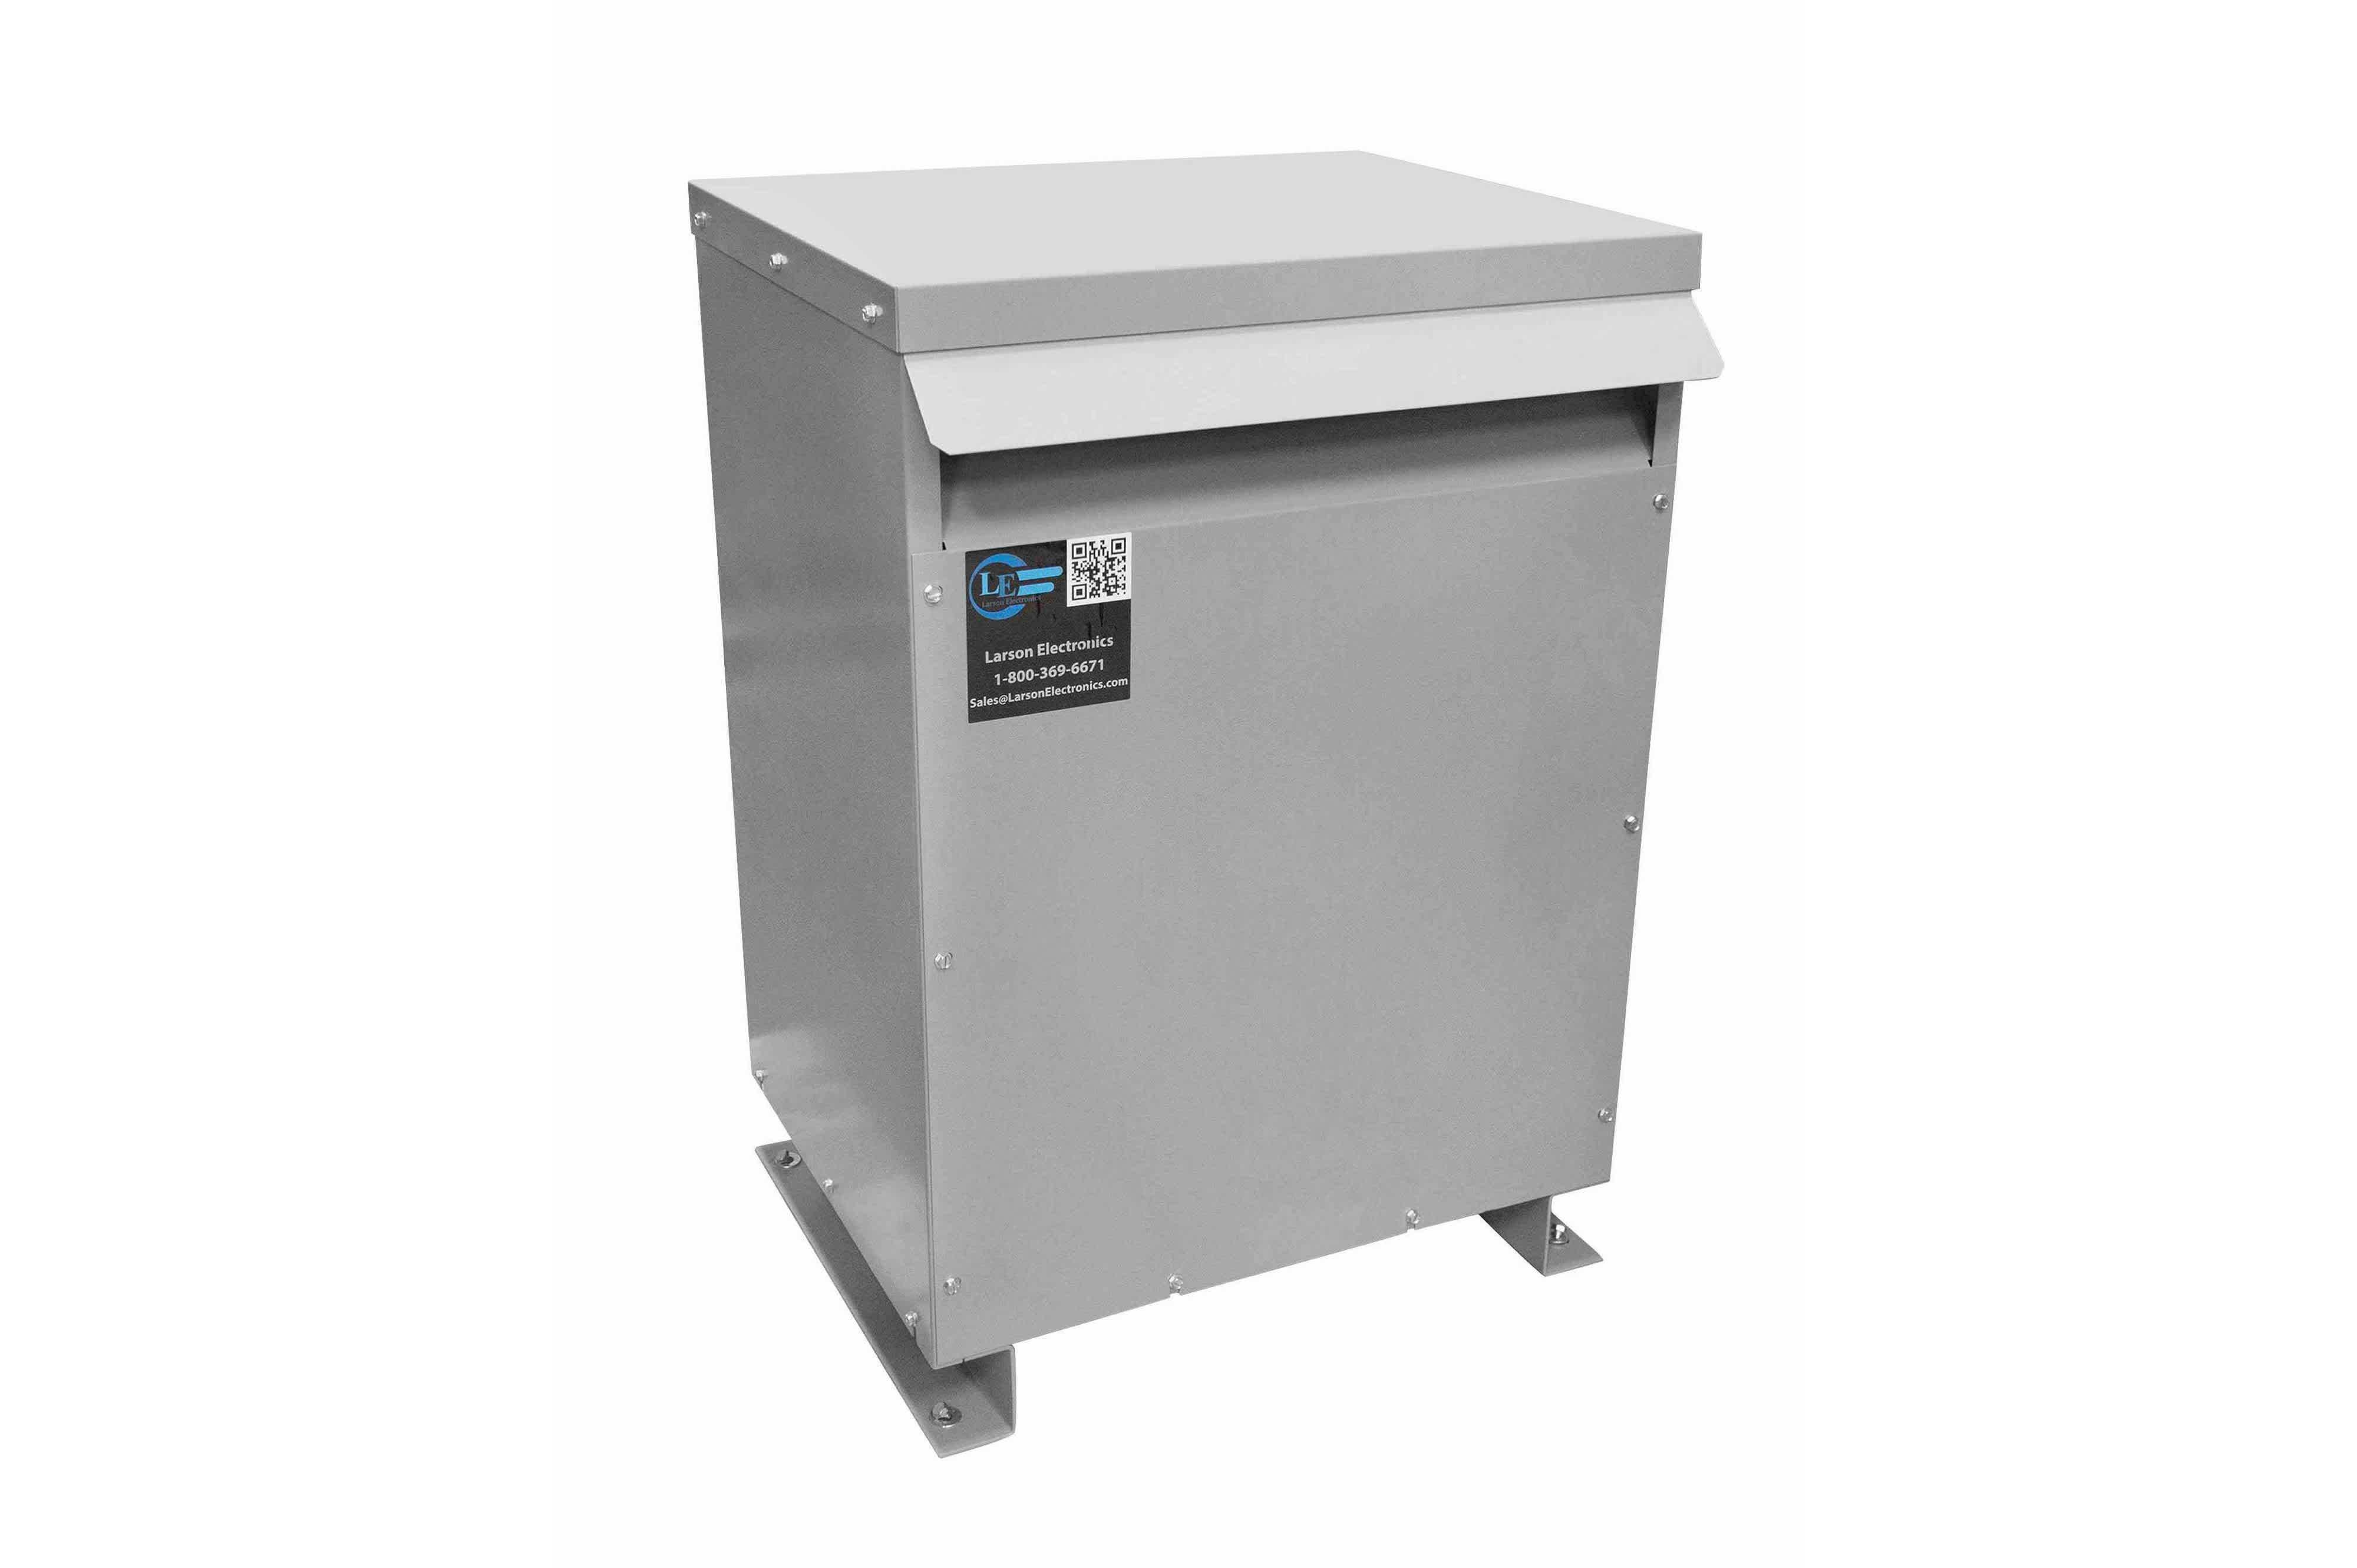 30 kVA 3PH DOE Transformer, 220V Delta Primary, 208Y/120 Wye-N Secondary, N3R, Ventilated, 60 Hz